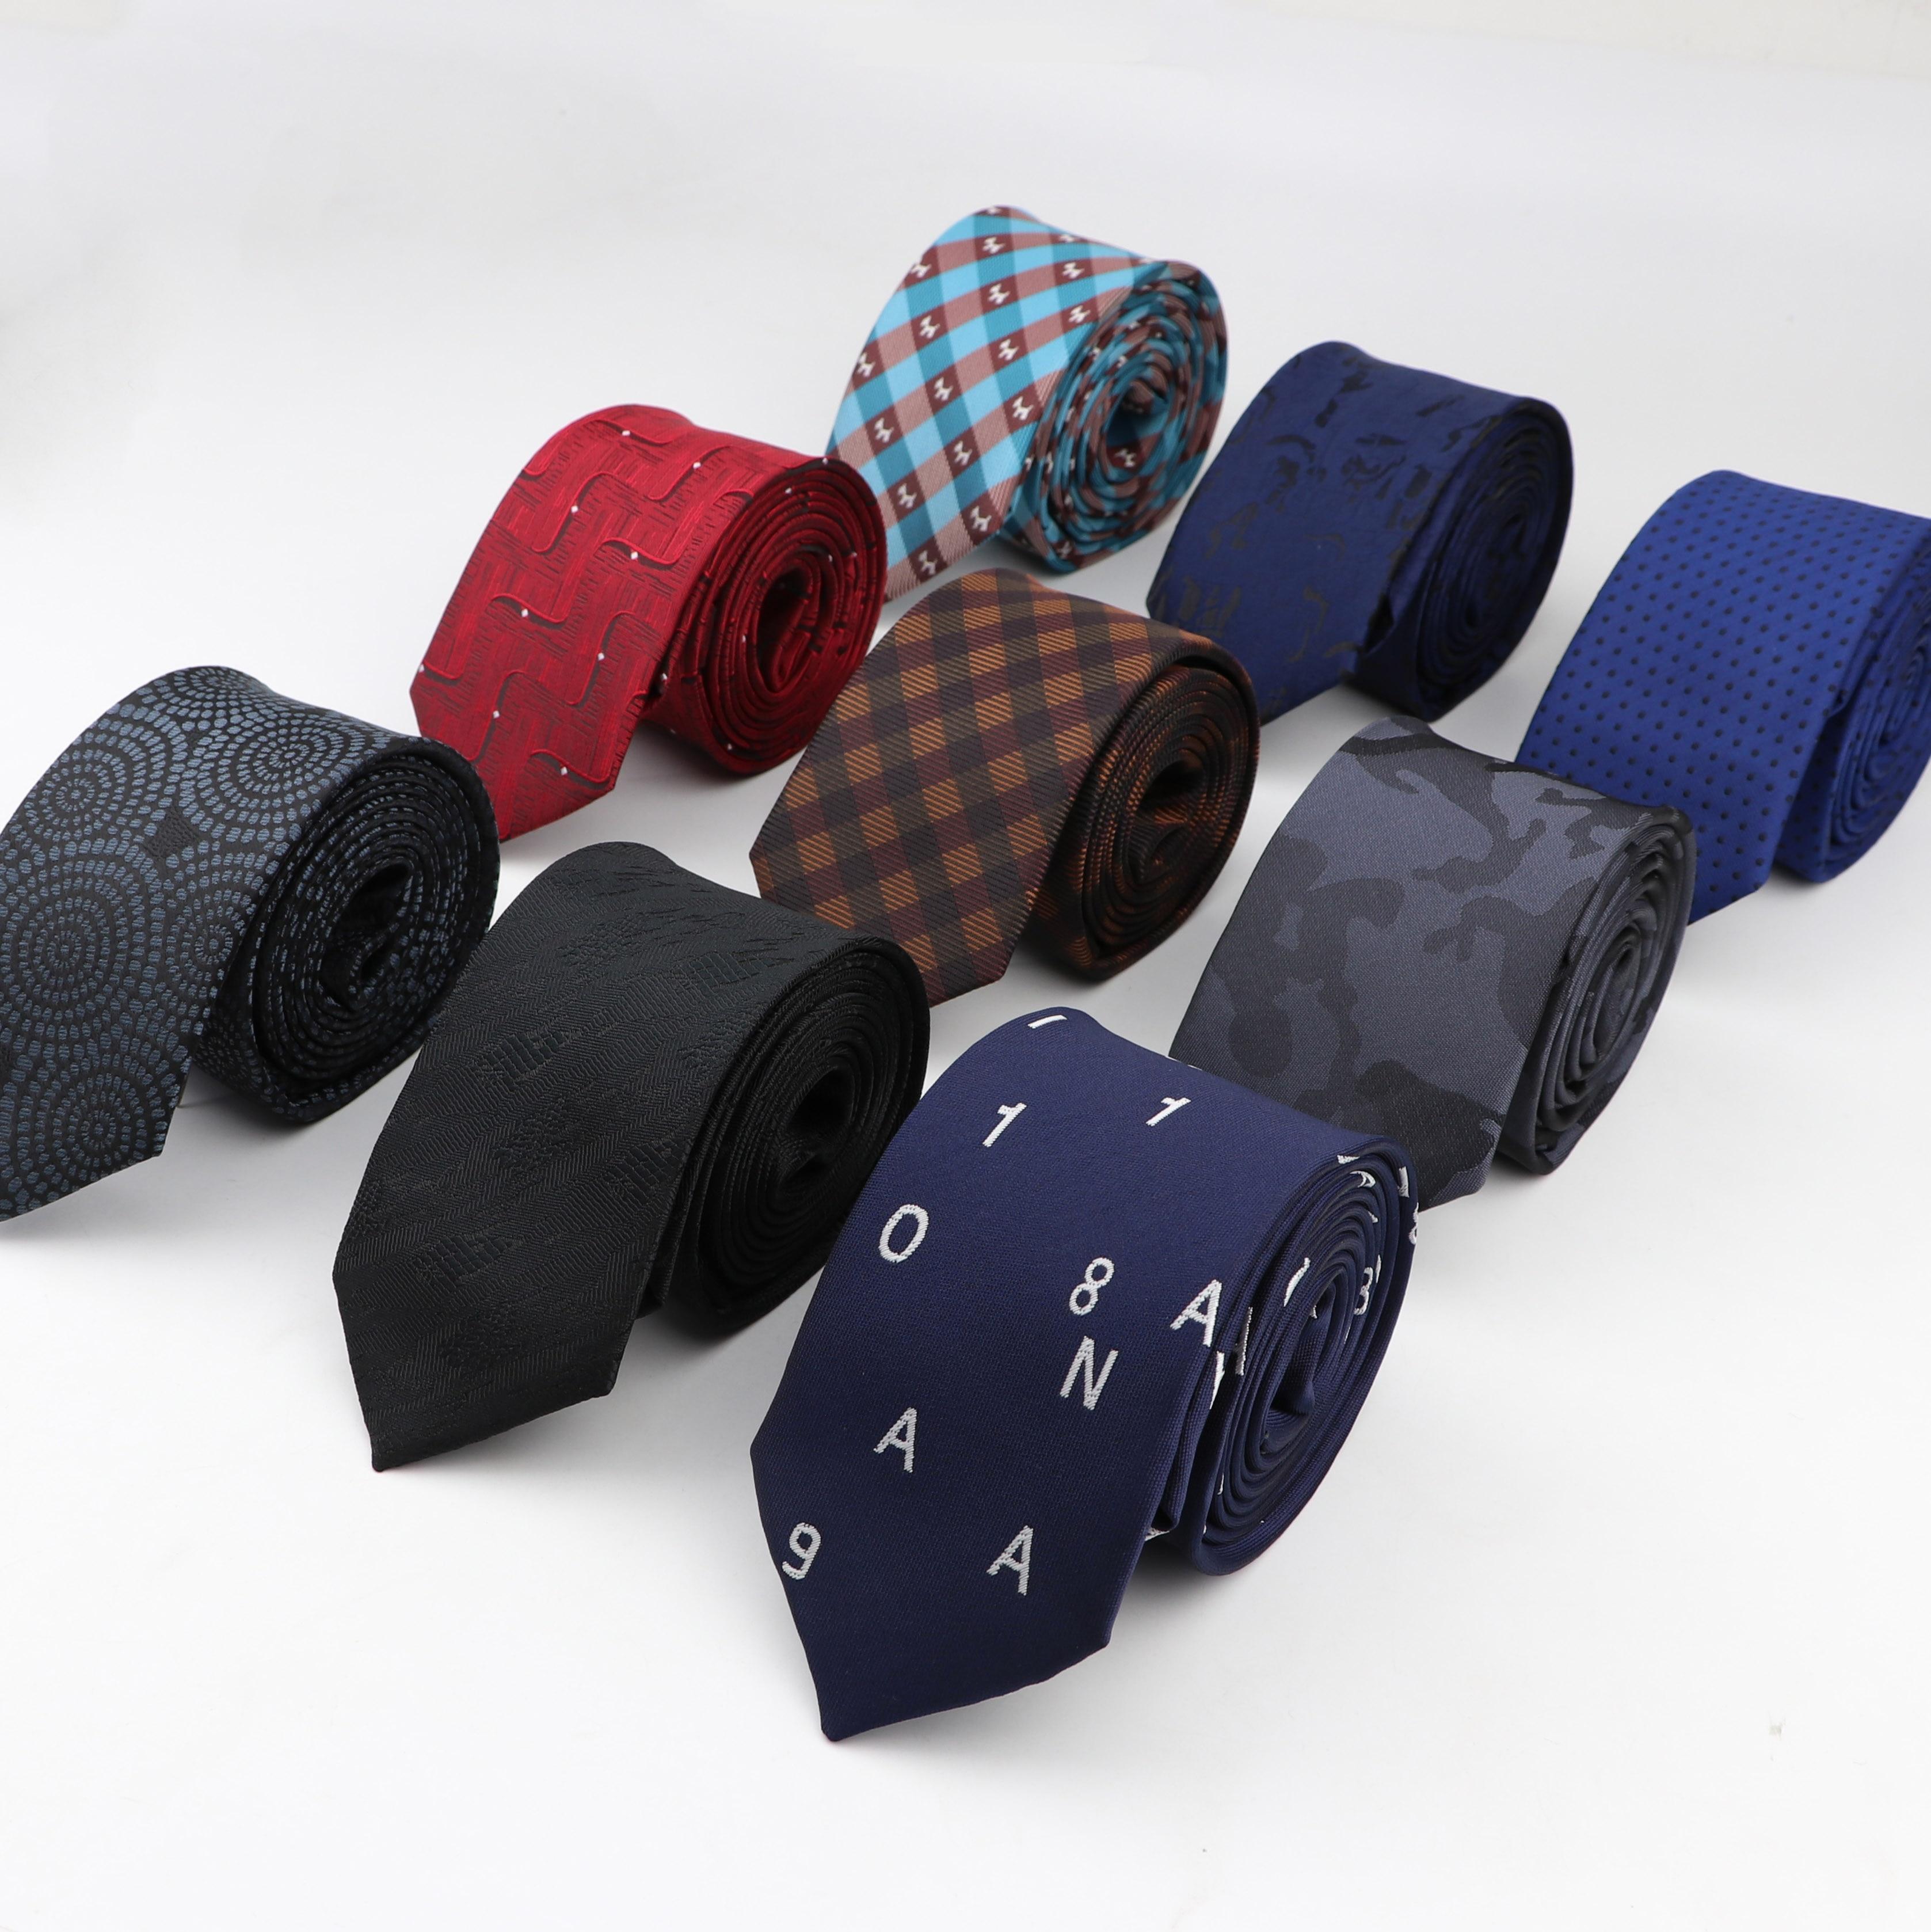 Mens Business Tie 6-7cm Width Dog Letter Designer Jacquard Wedding Necktie Narrow Classic Ties 1200 Needles Polyester Neckwear